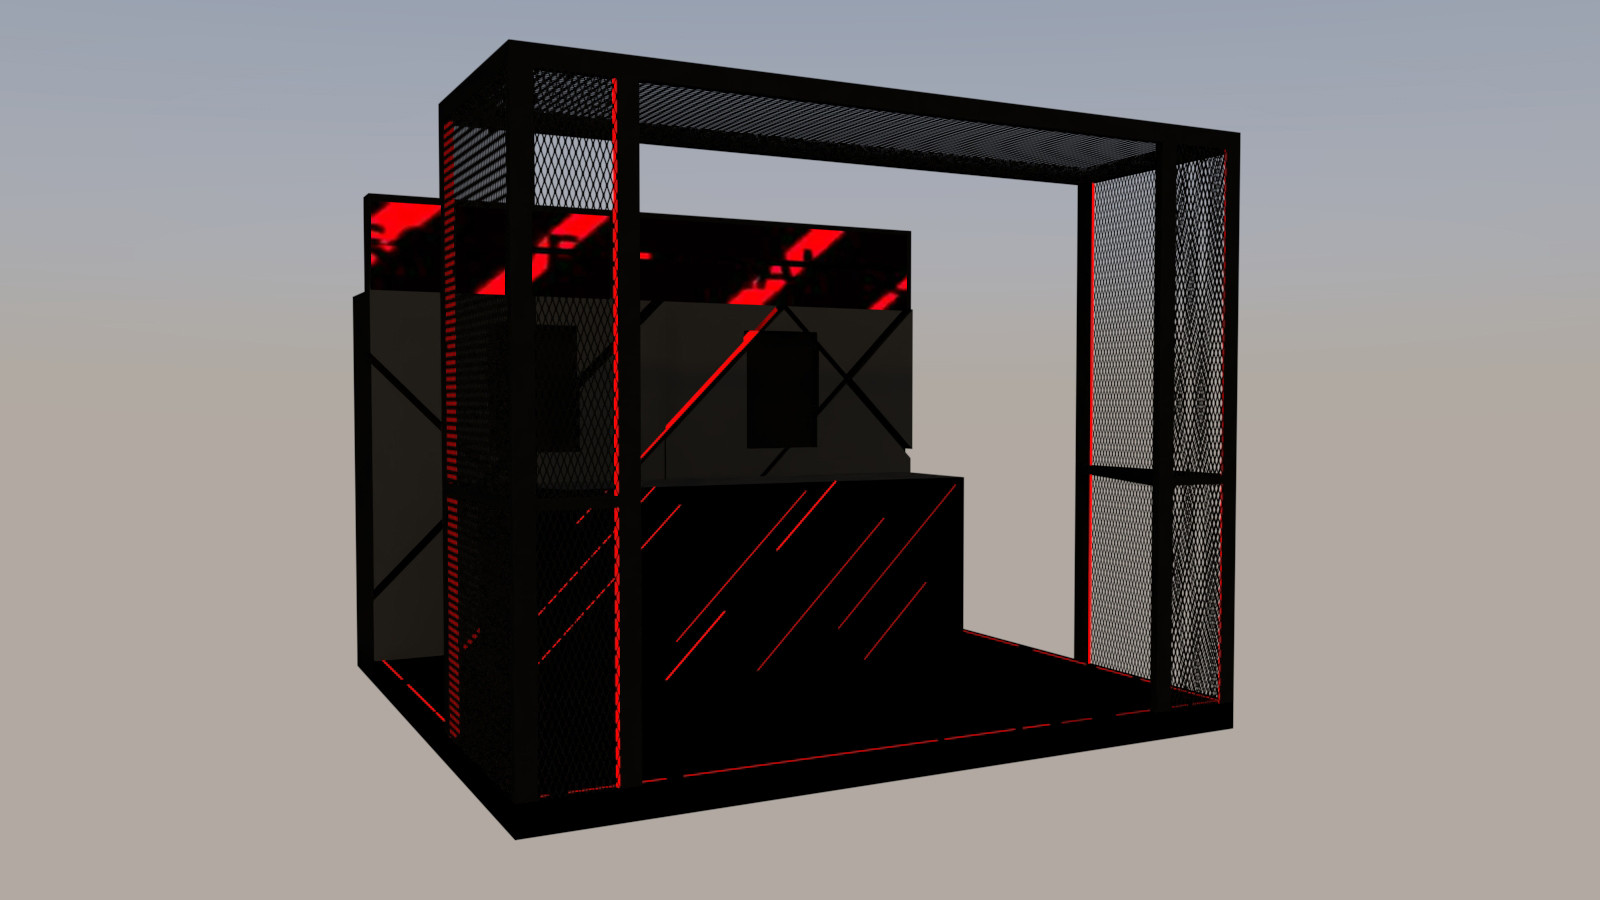 Asahi Stand Visual v4 view 1.jpg